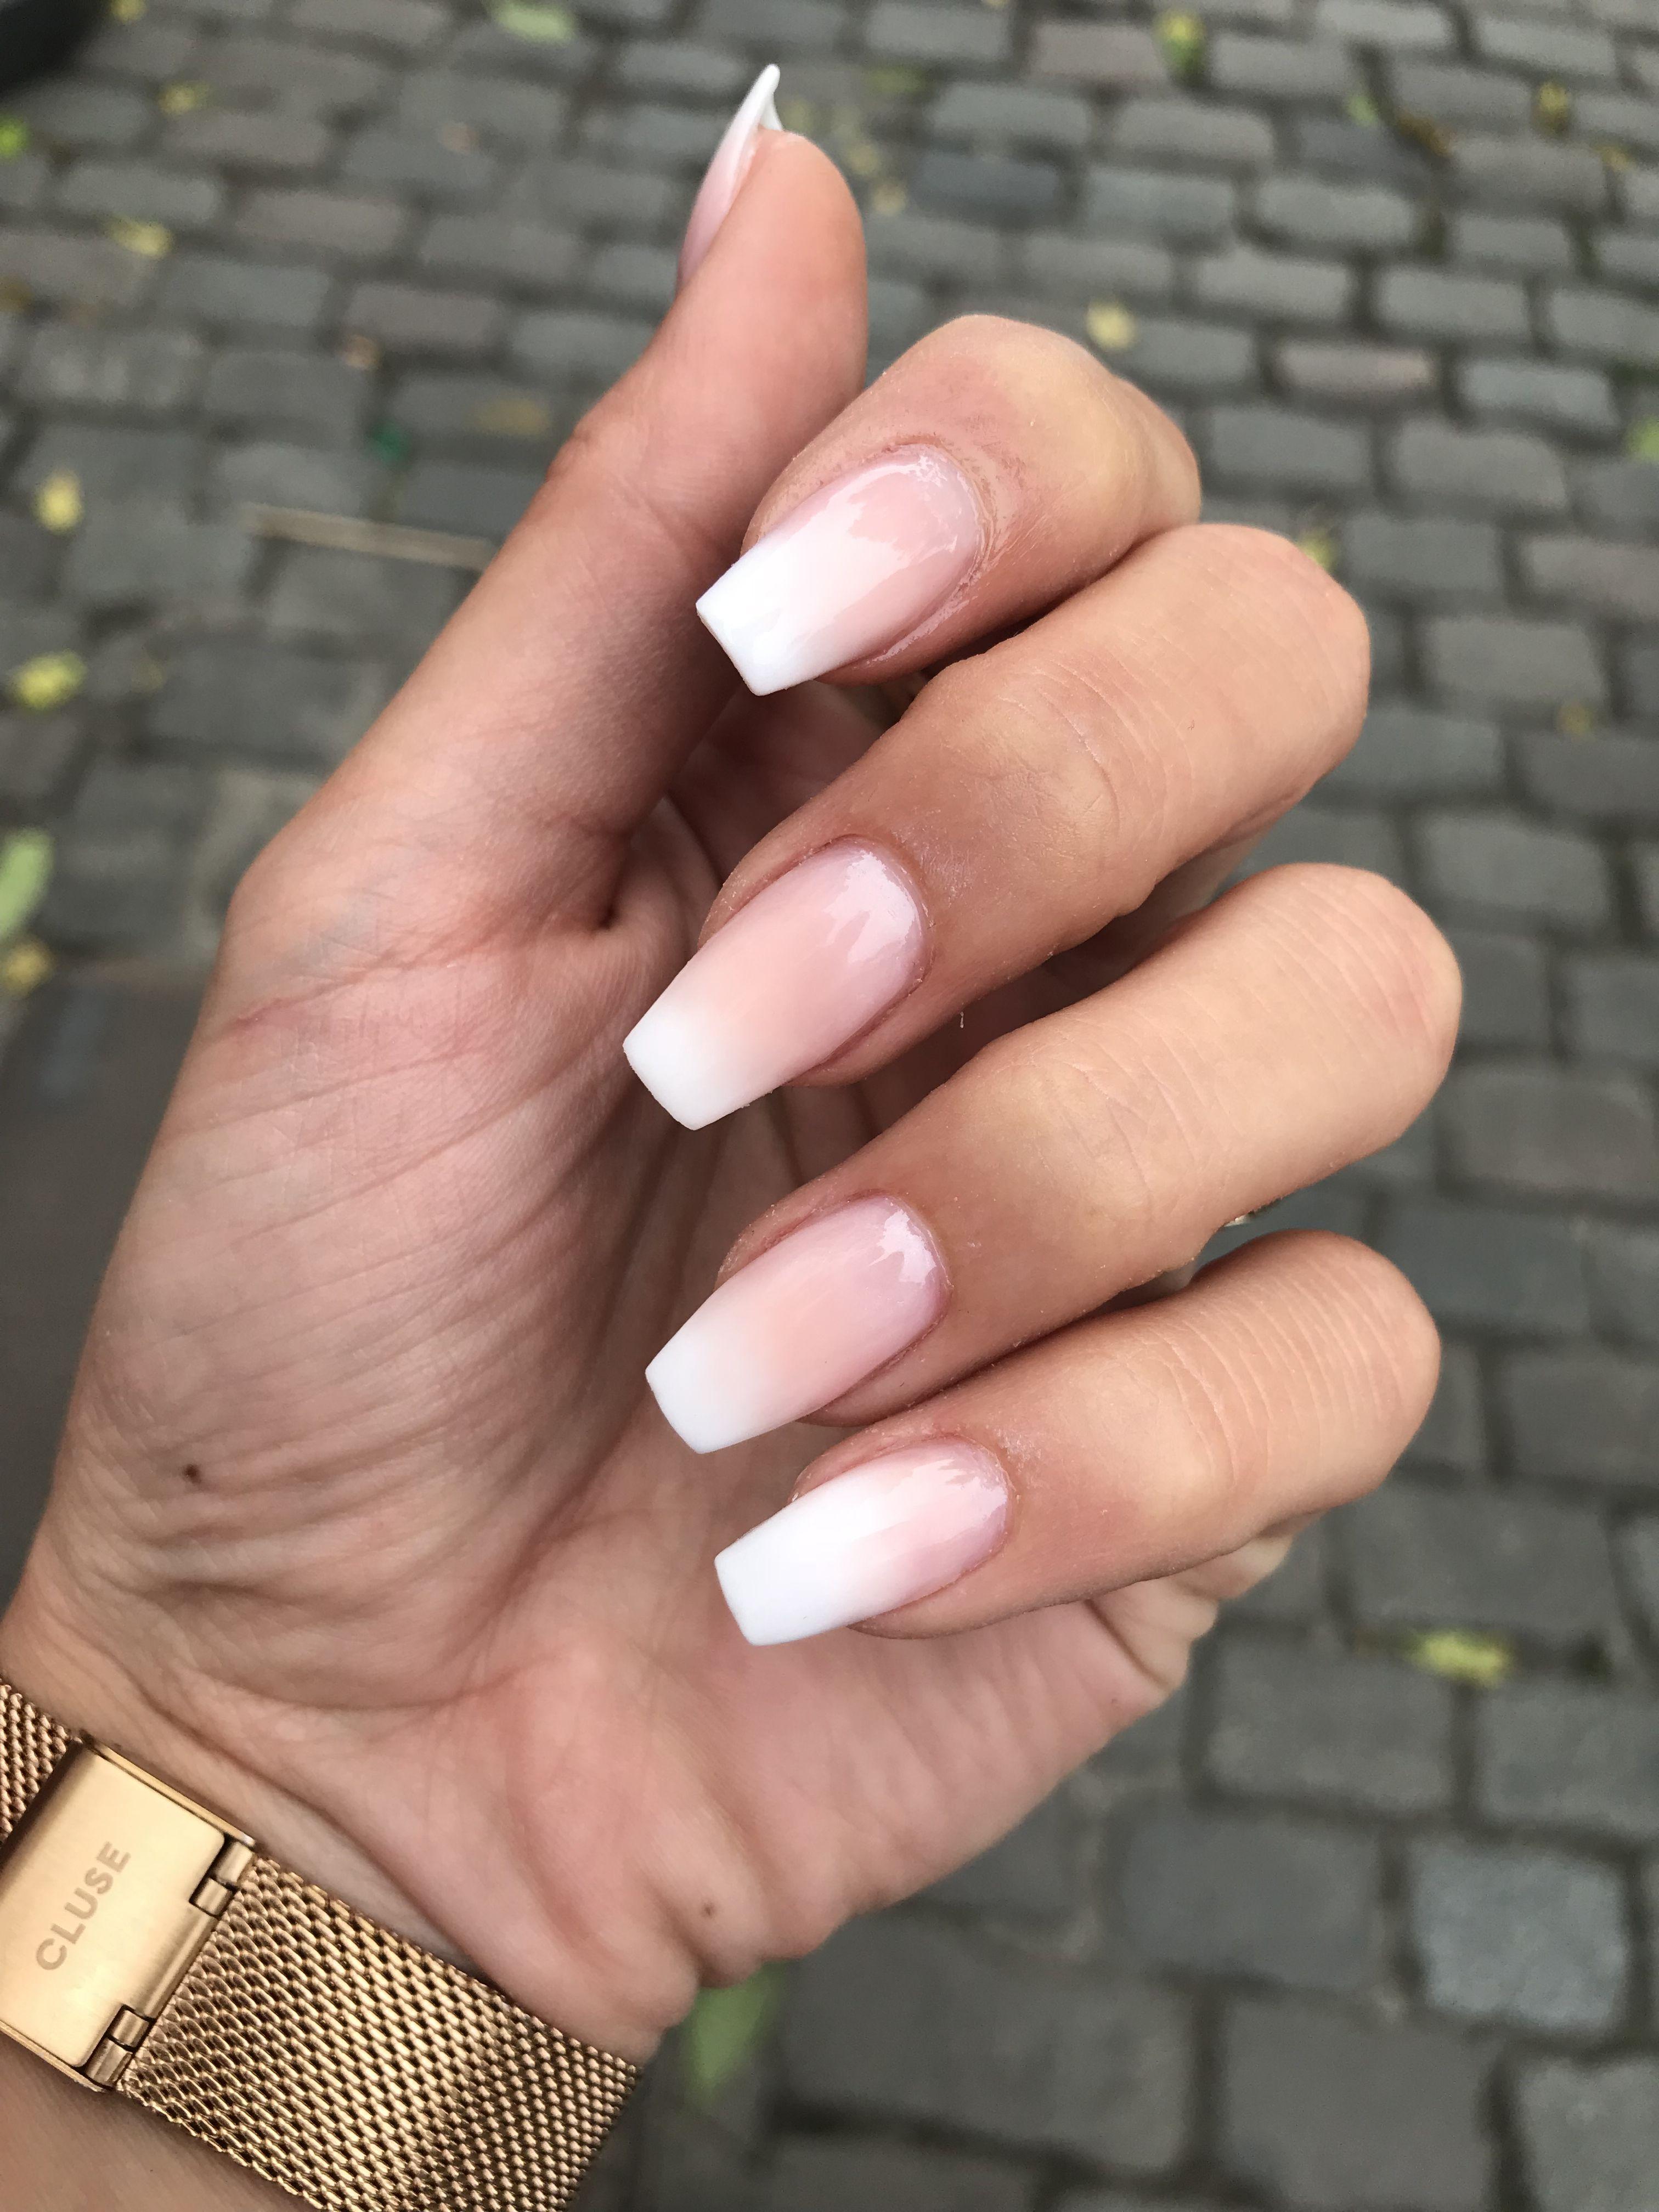 Timeless baby boomer | Cute acrylic nails, Ambre nails ...